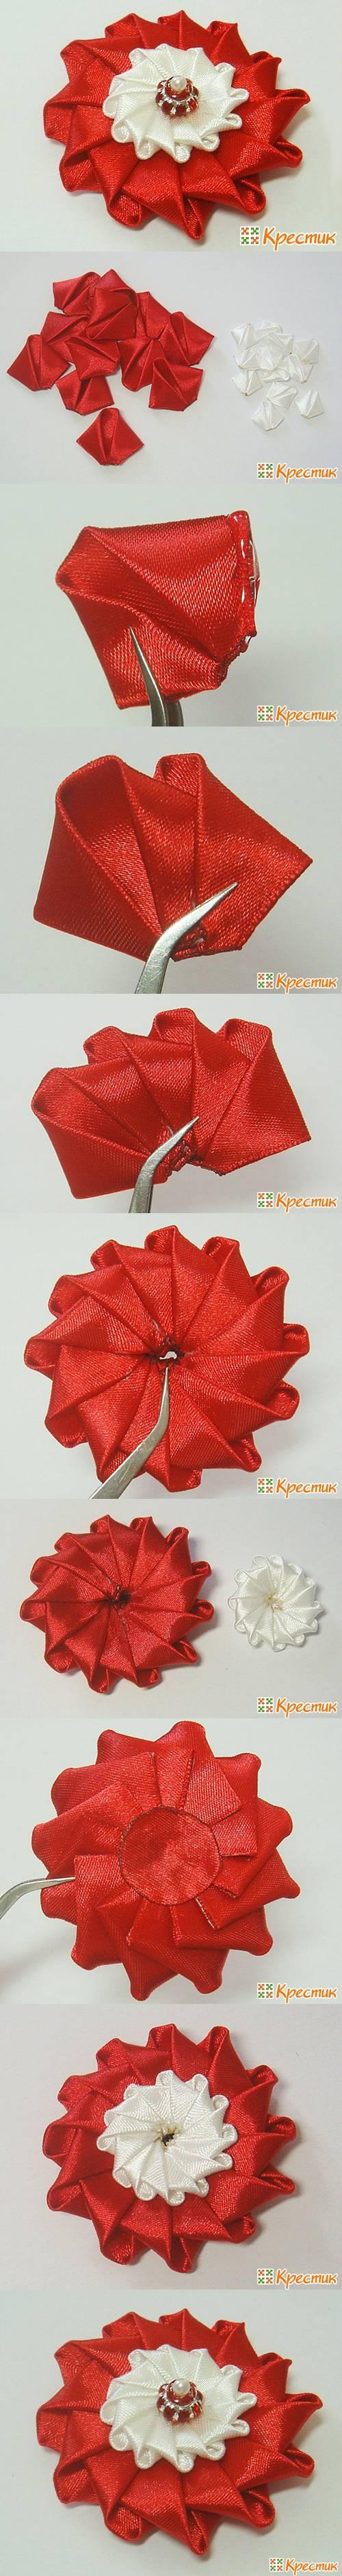 DIY Bright Satin Ribbon Flower